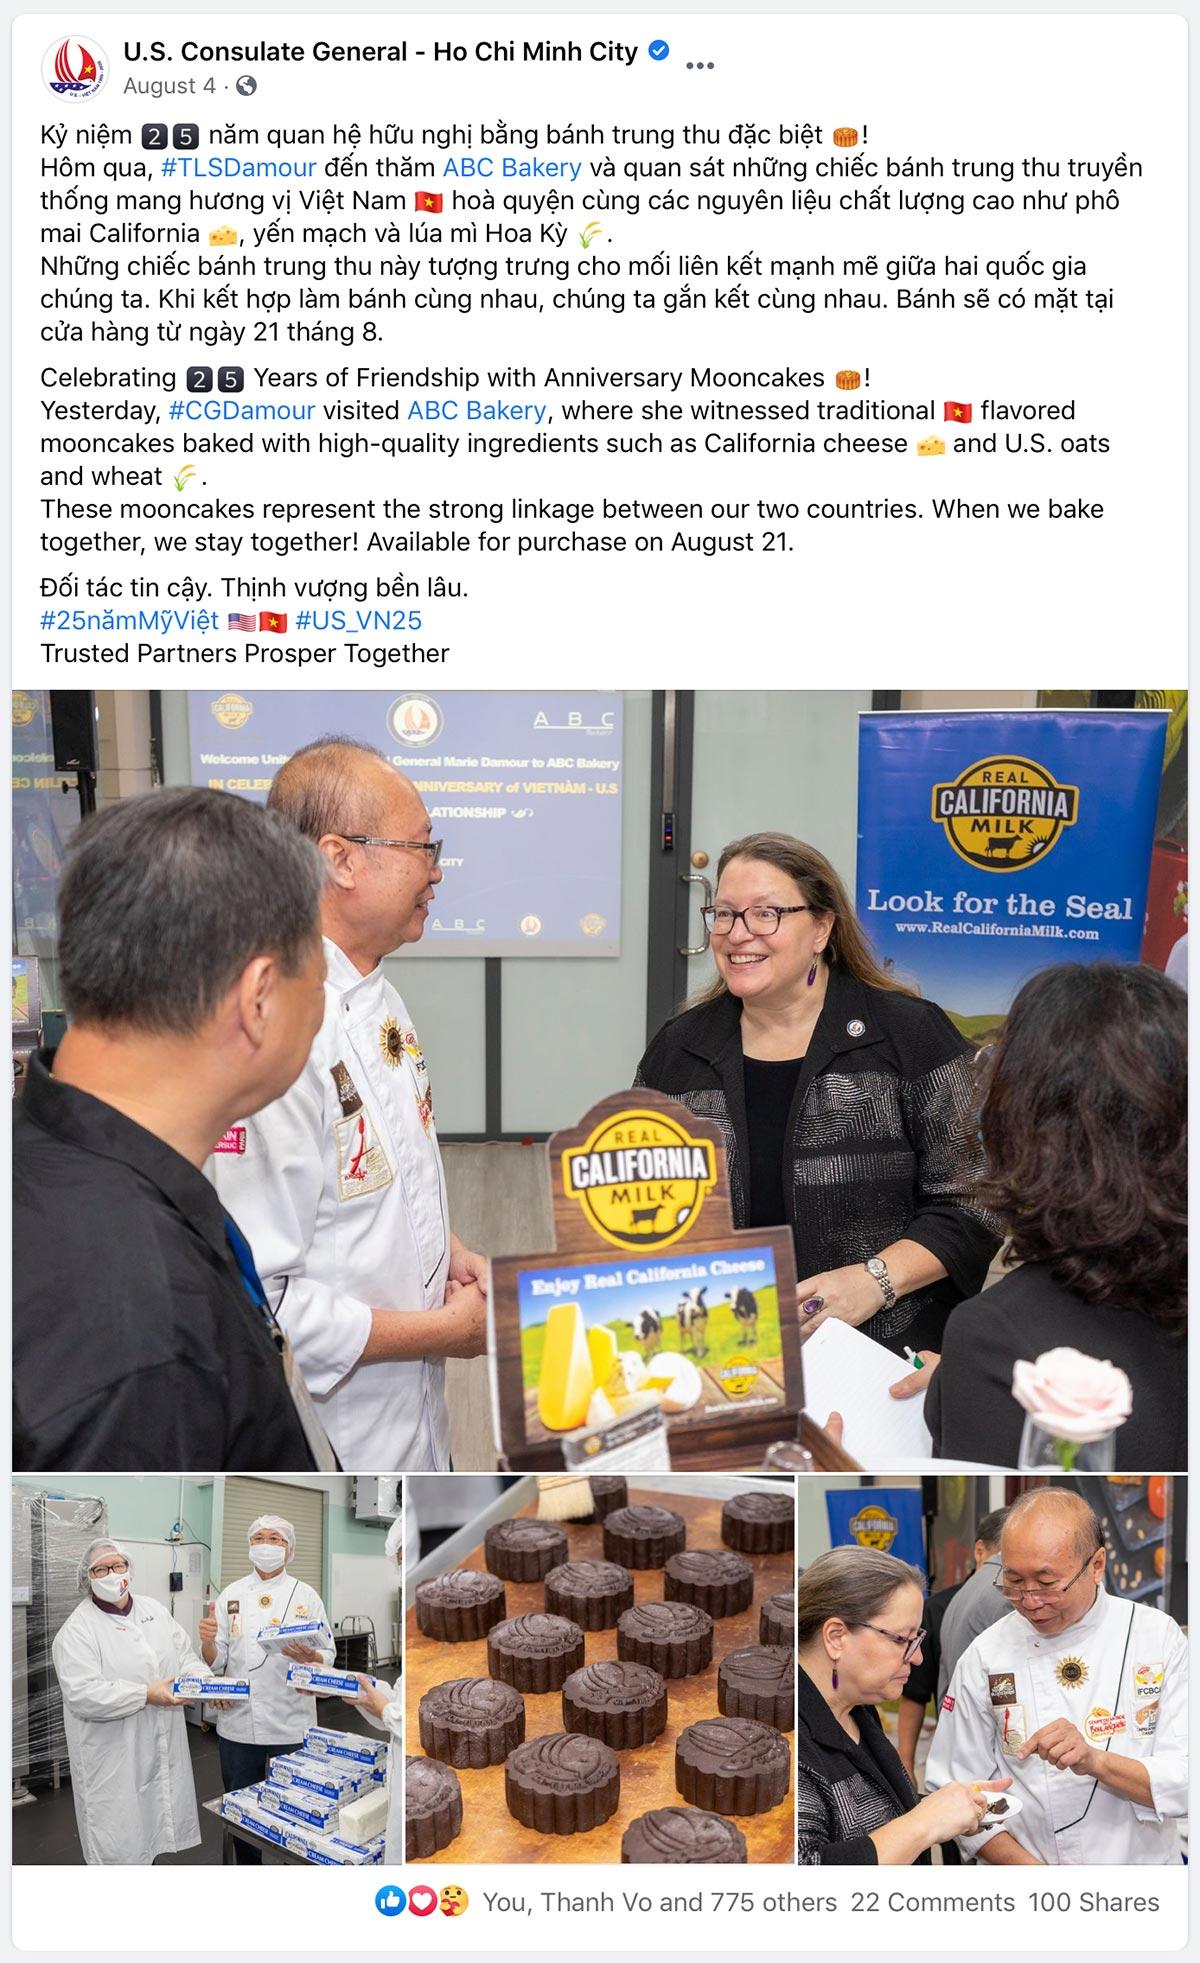 U.S. Consul General tour to ABC Bakery